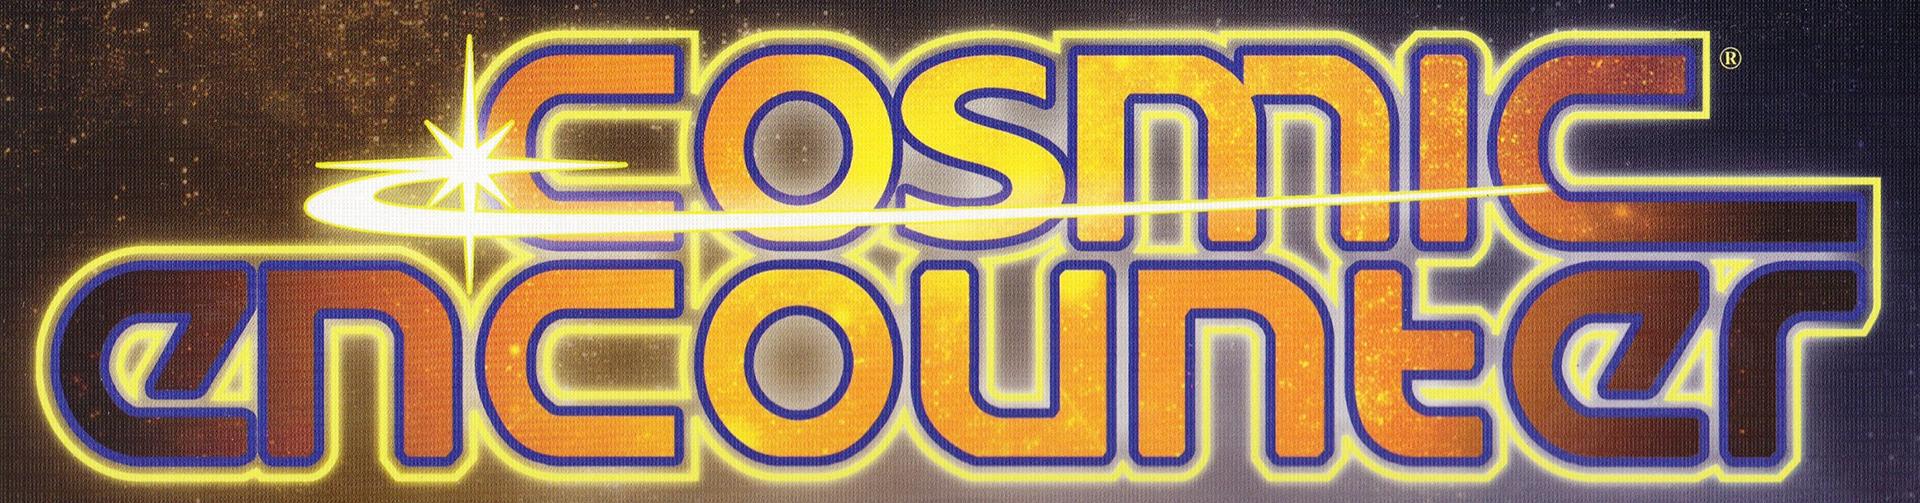 cosmic encounter logo.png